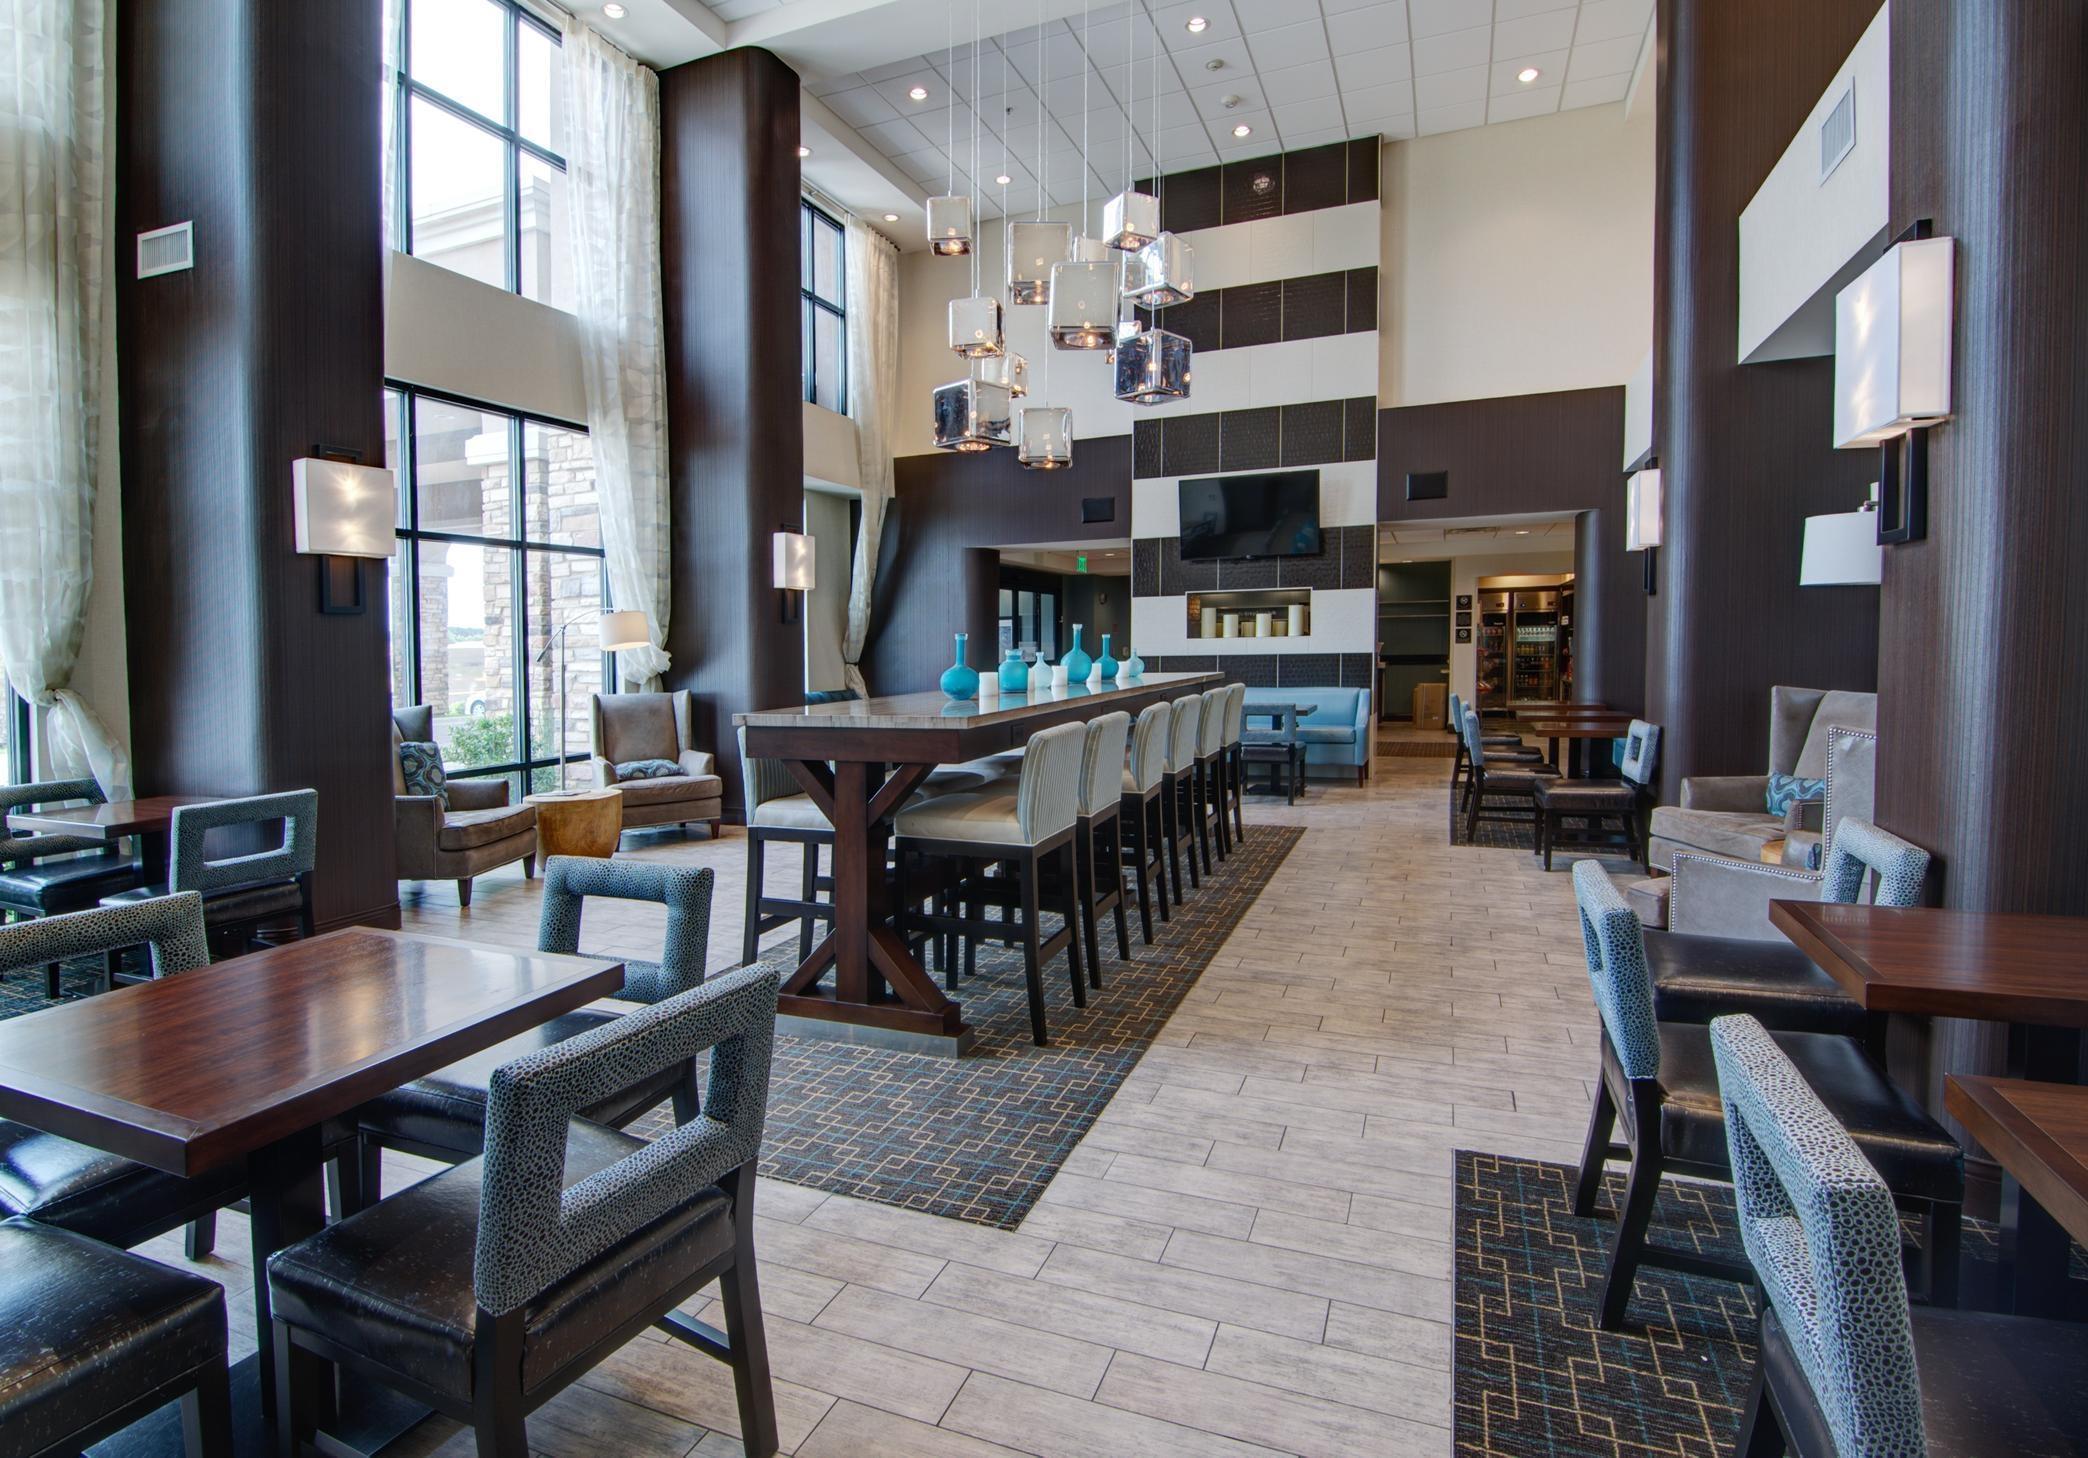 Hampton Inn & Suites Trophy Club - Fort Worth North image 5